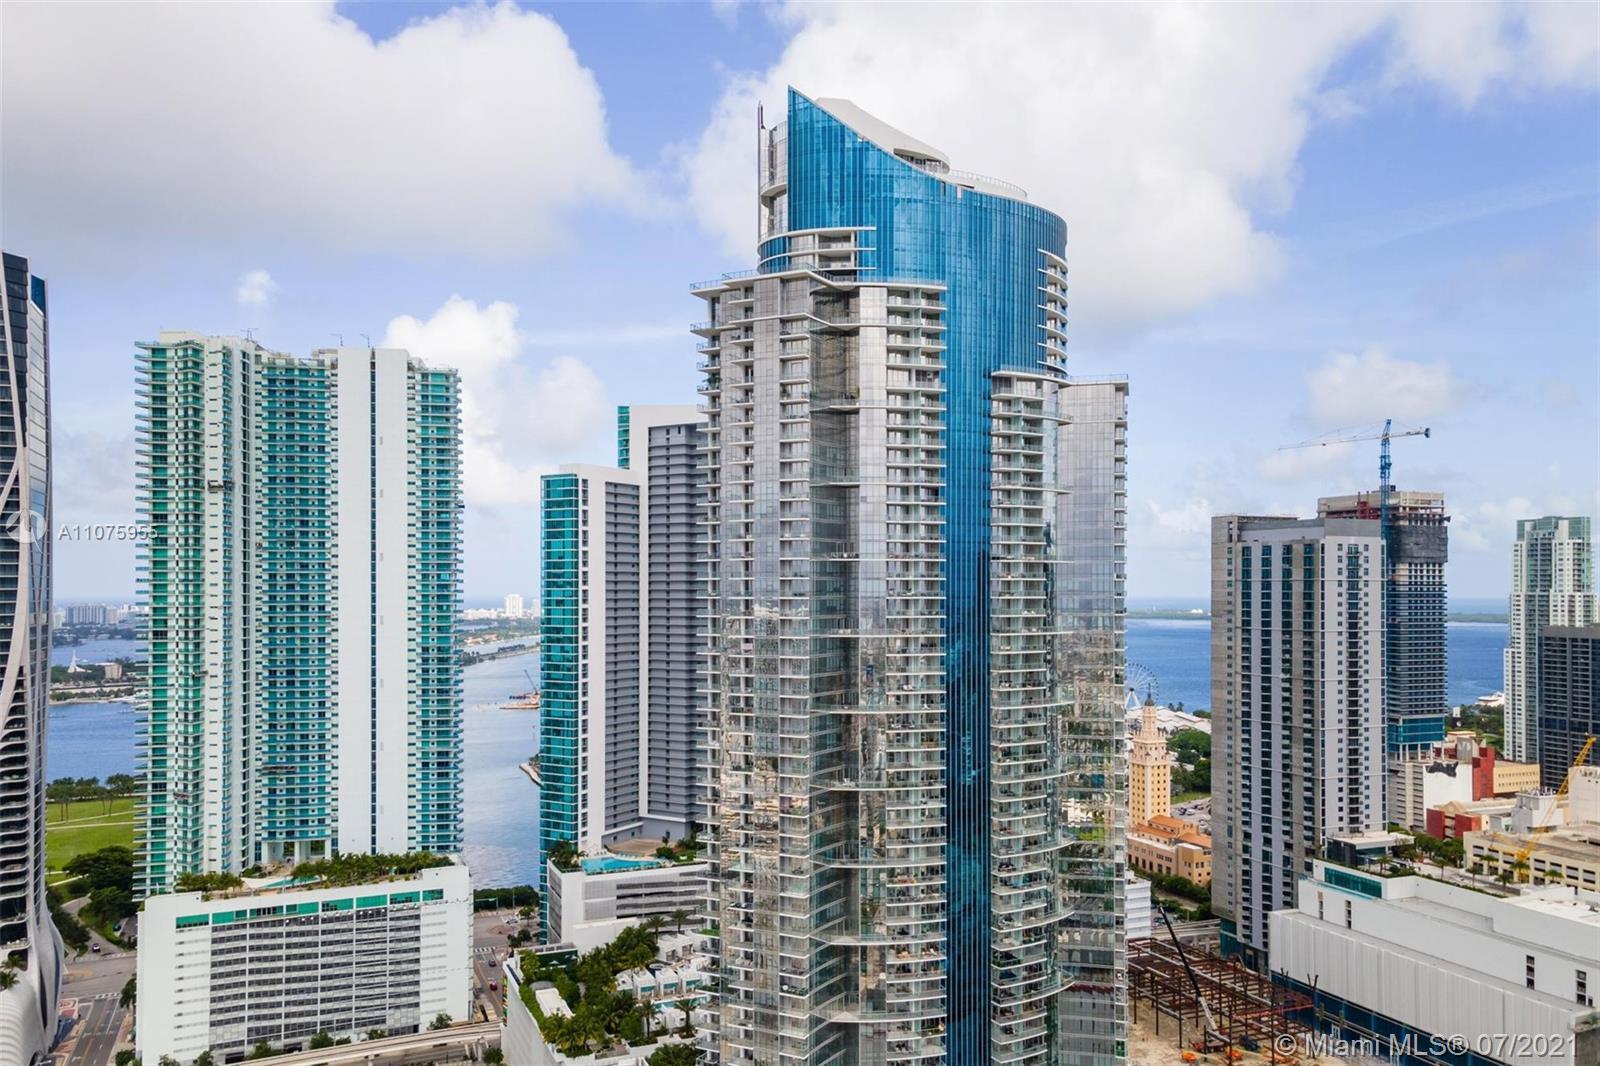 Paramount Miami Worldcenter #3011 - 851 NE 1st Ave #3011, Miami, FL 33132